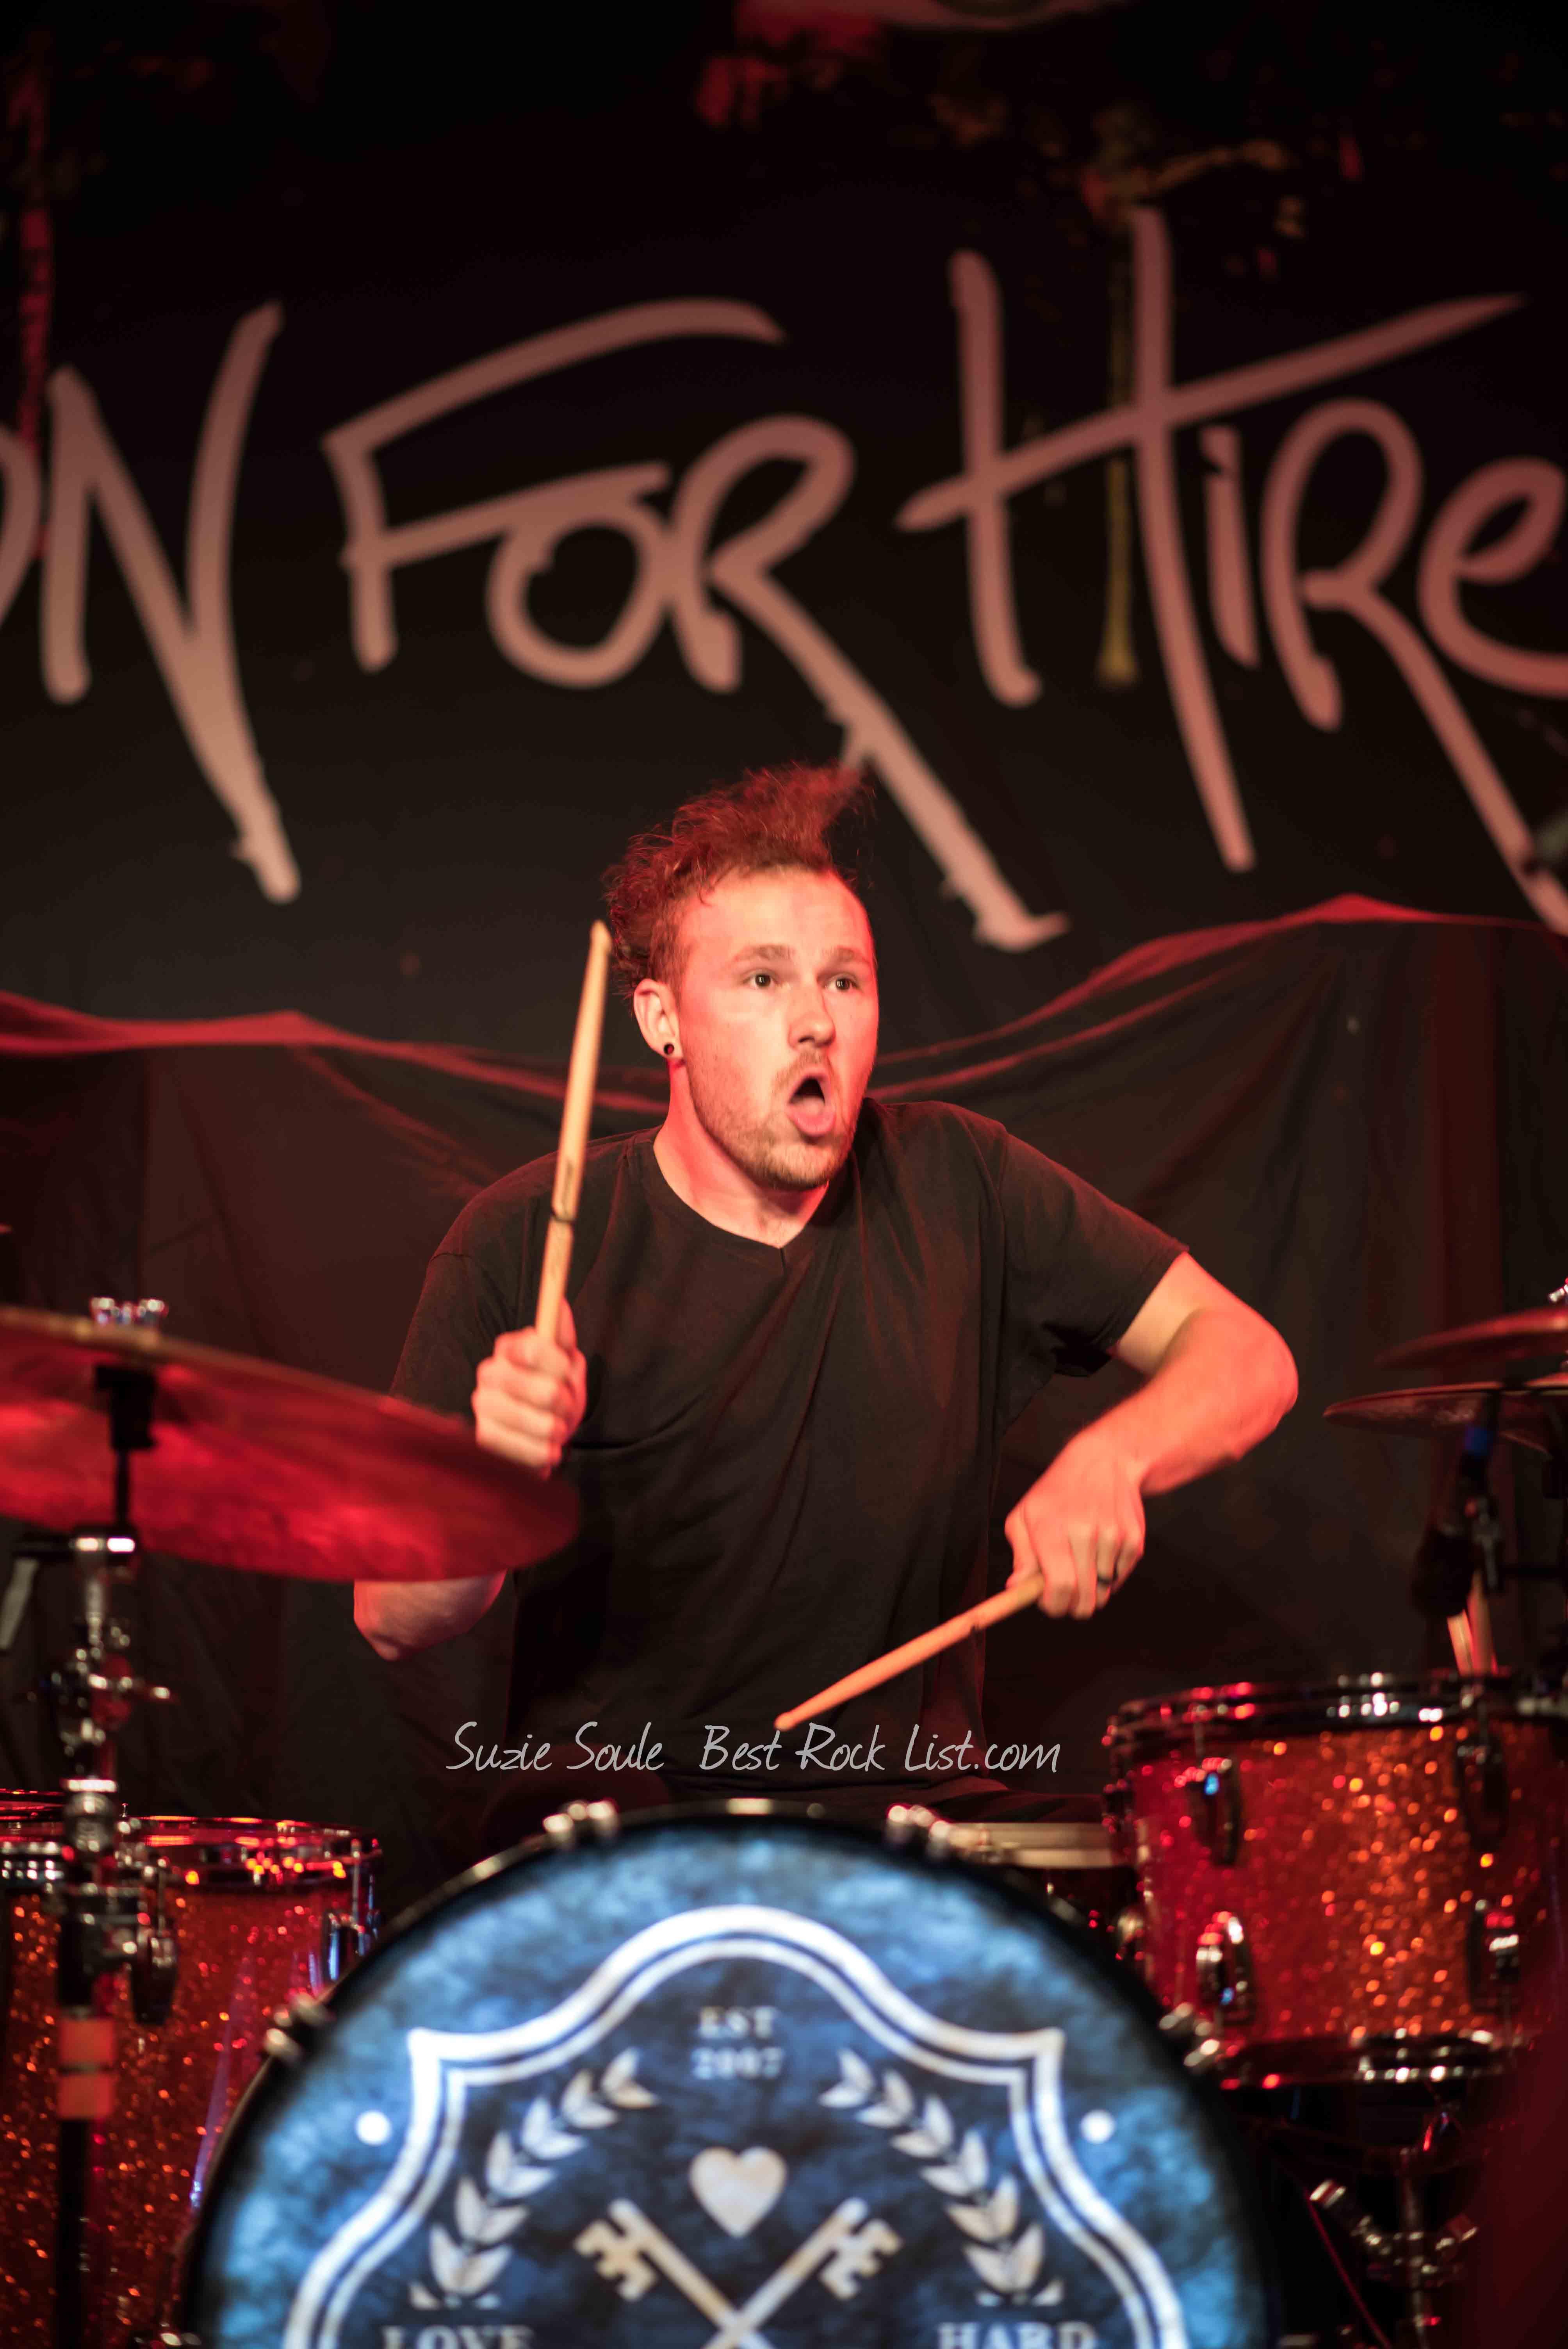 Derrick Huskey of Fivefold